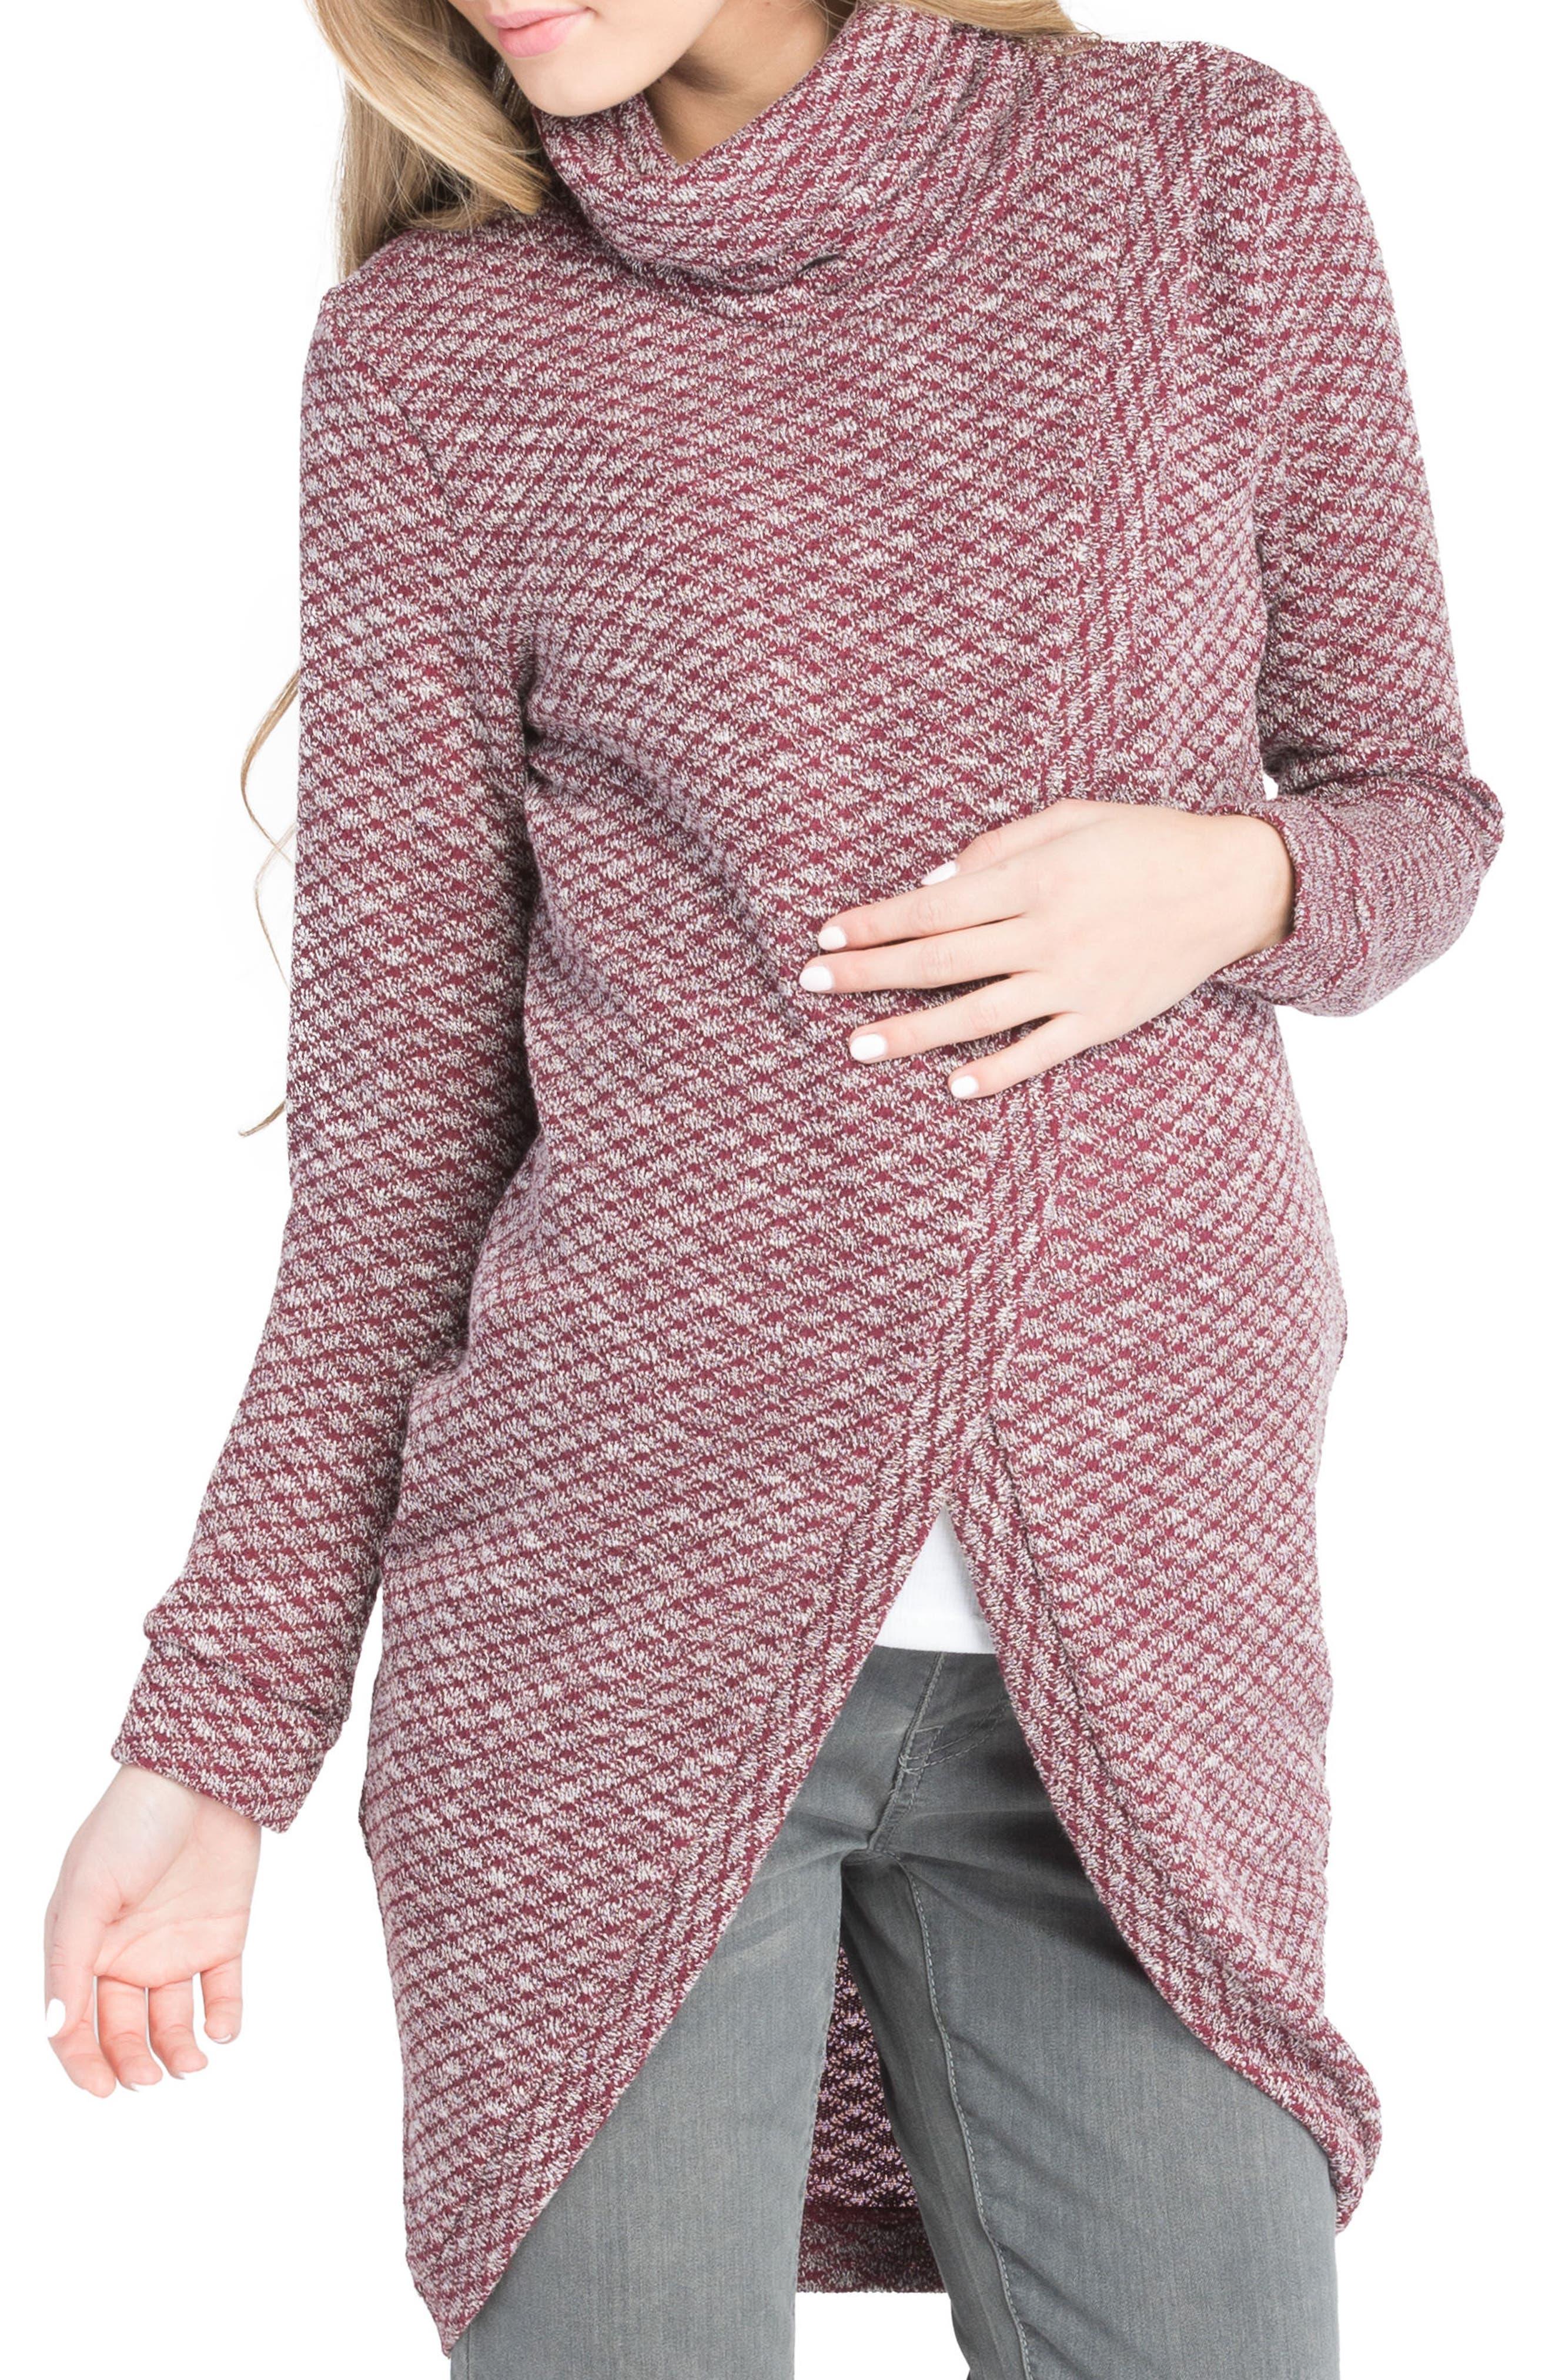 Lilac Clothing Nursing Tunic Sweater